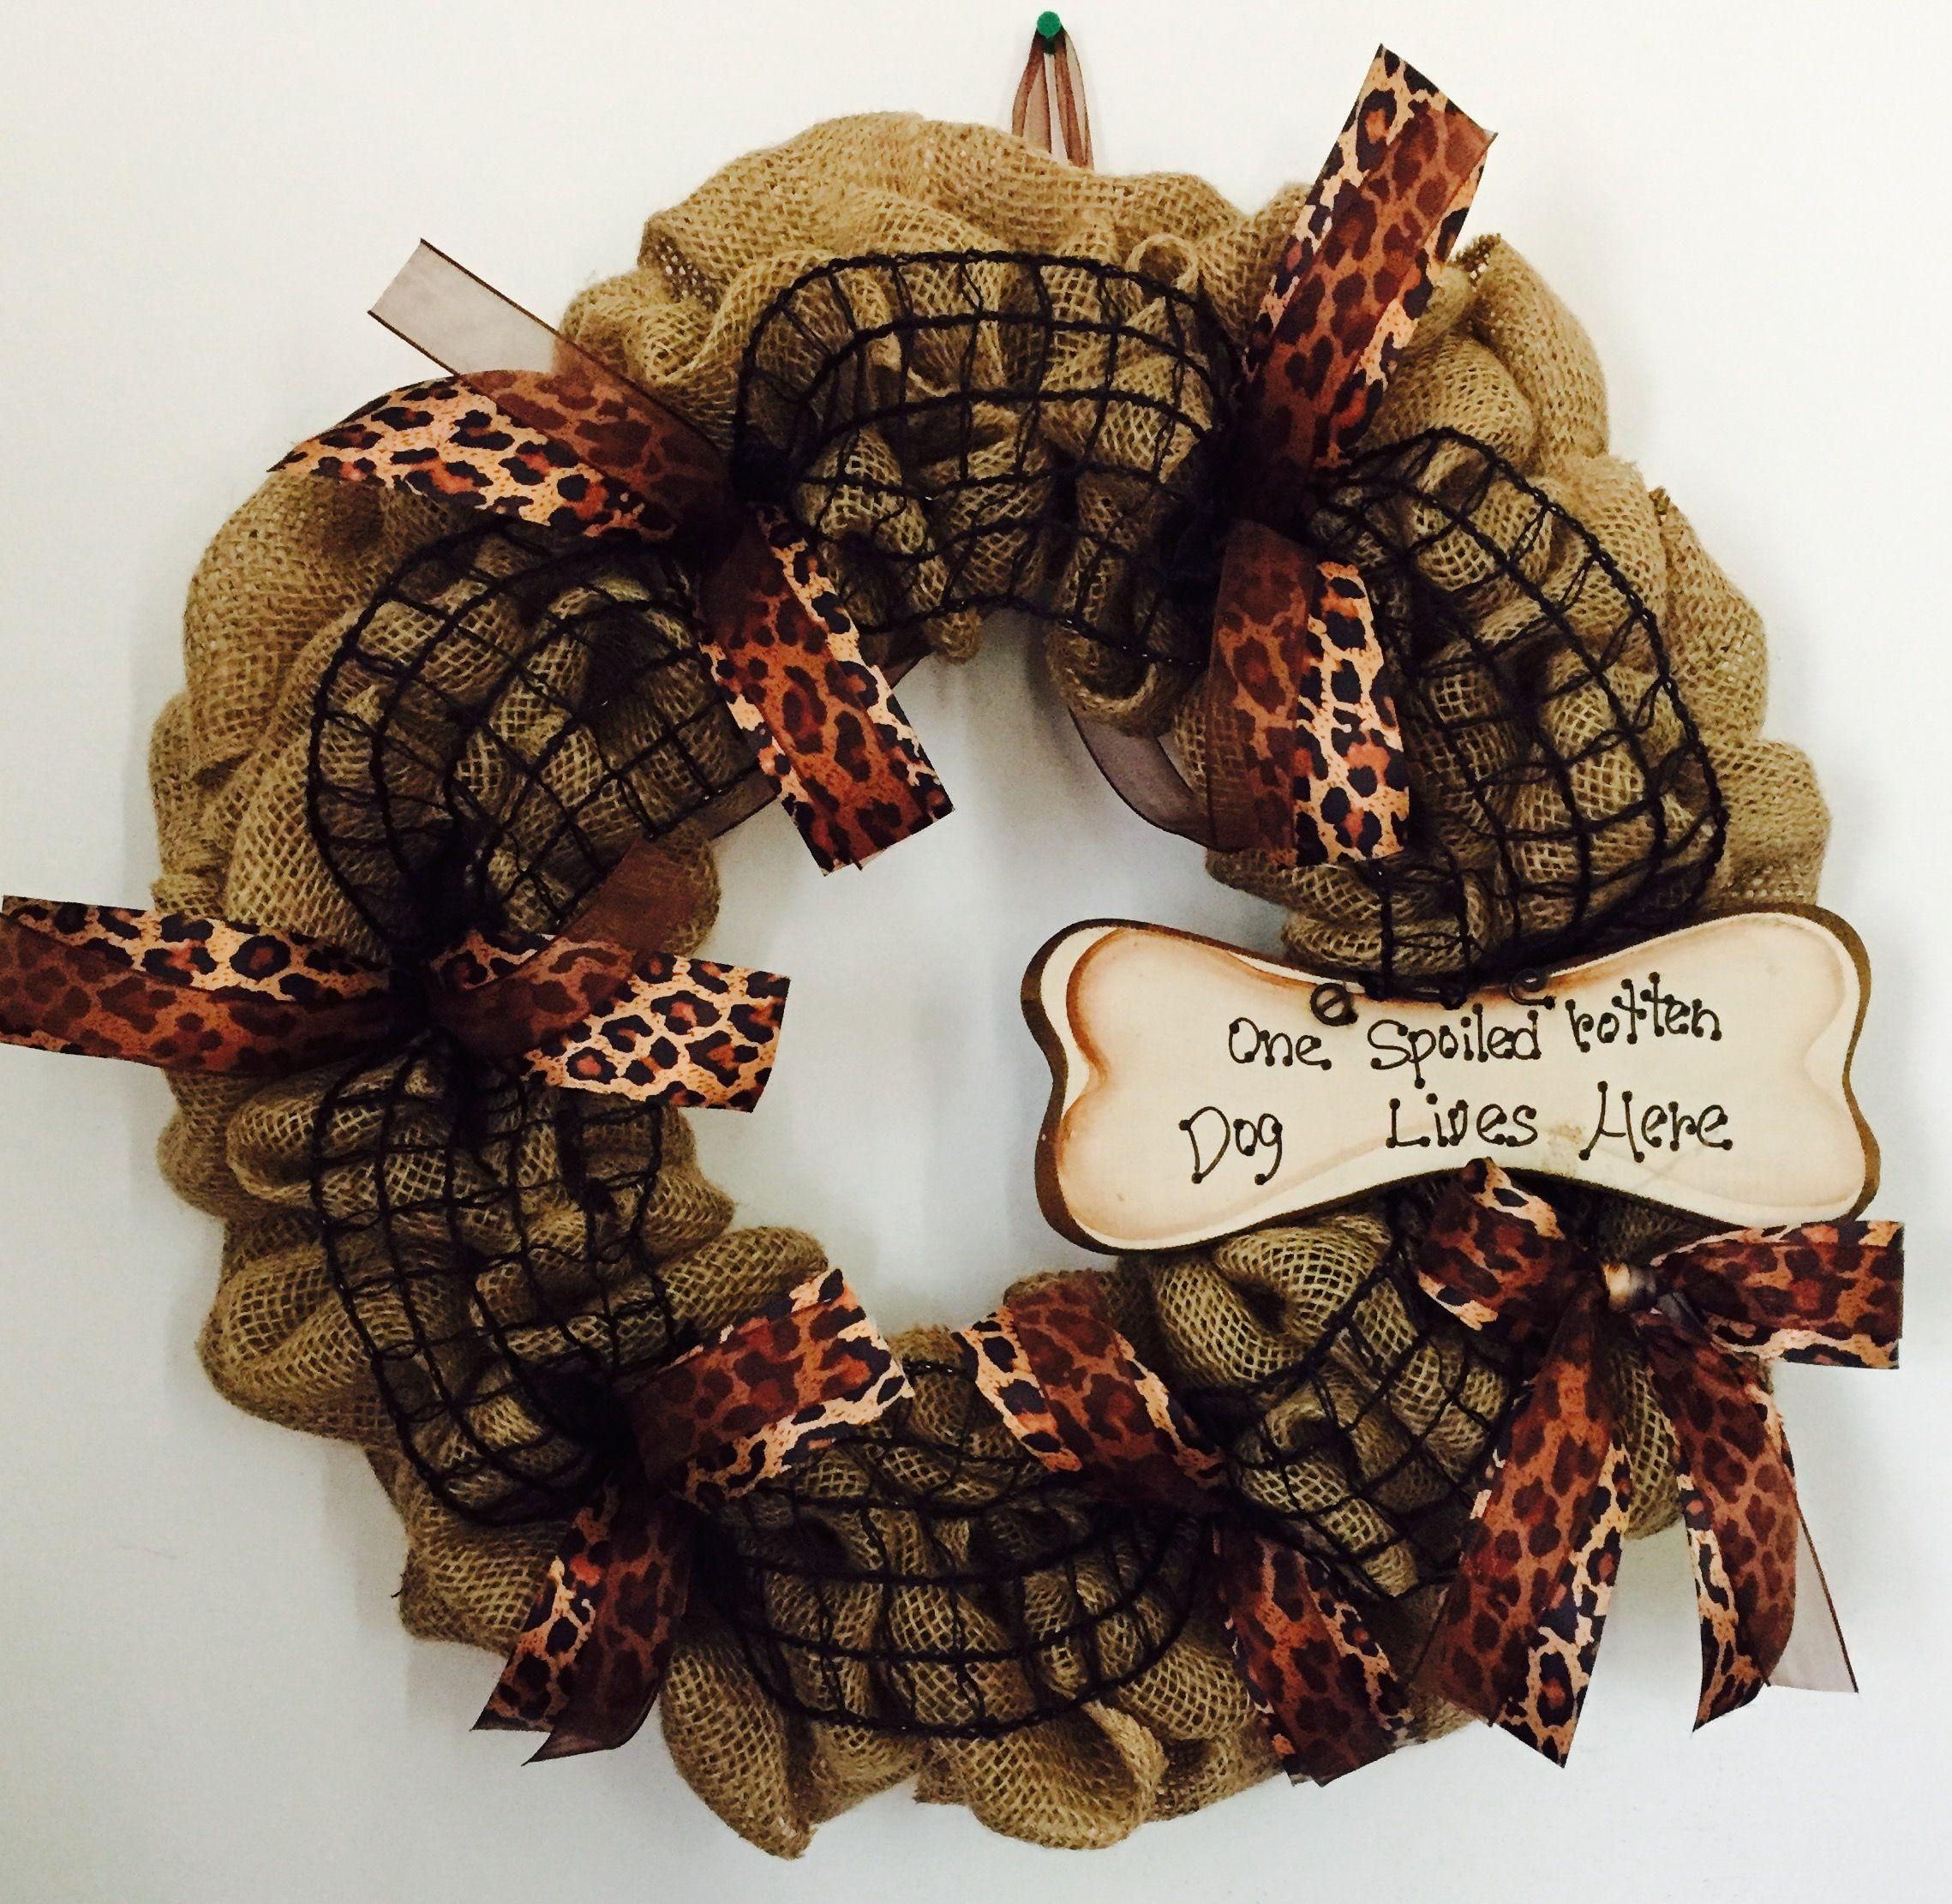 Dog Burlap wreaths